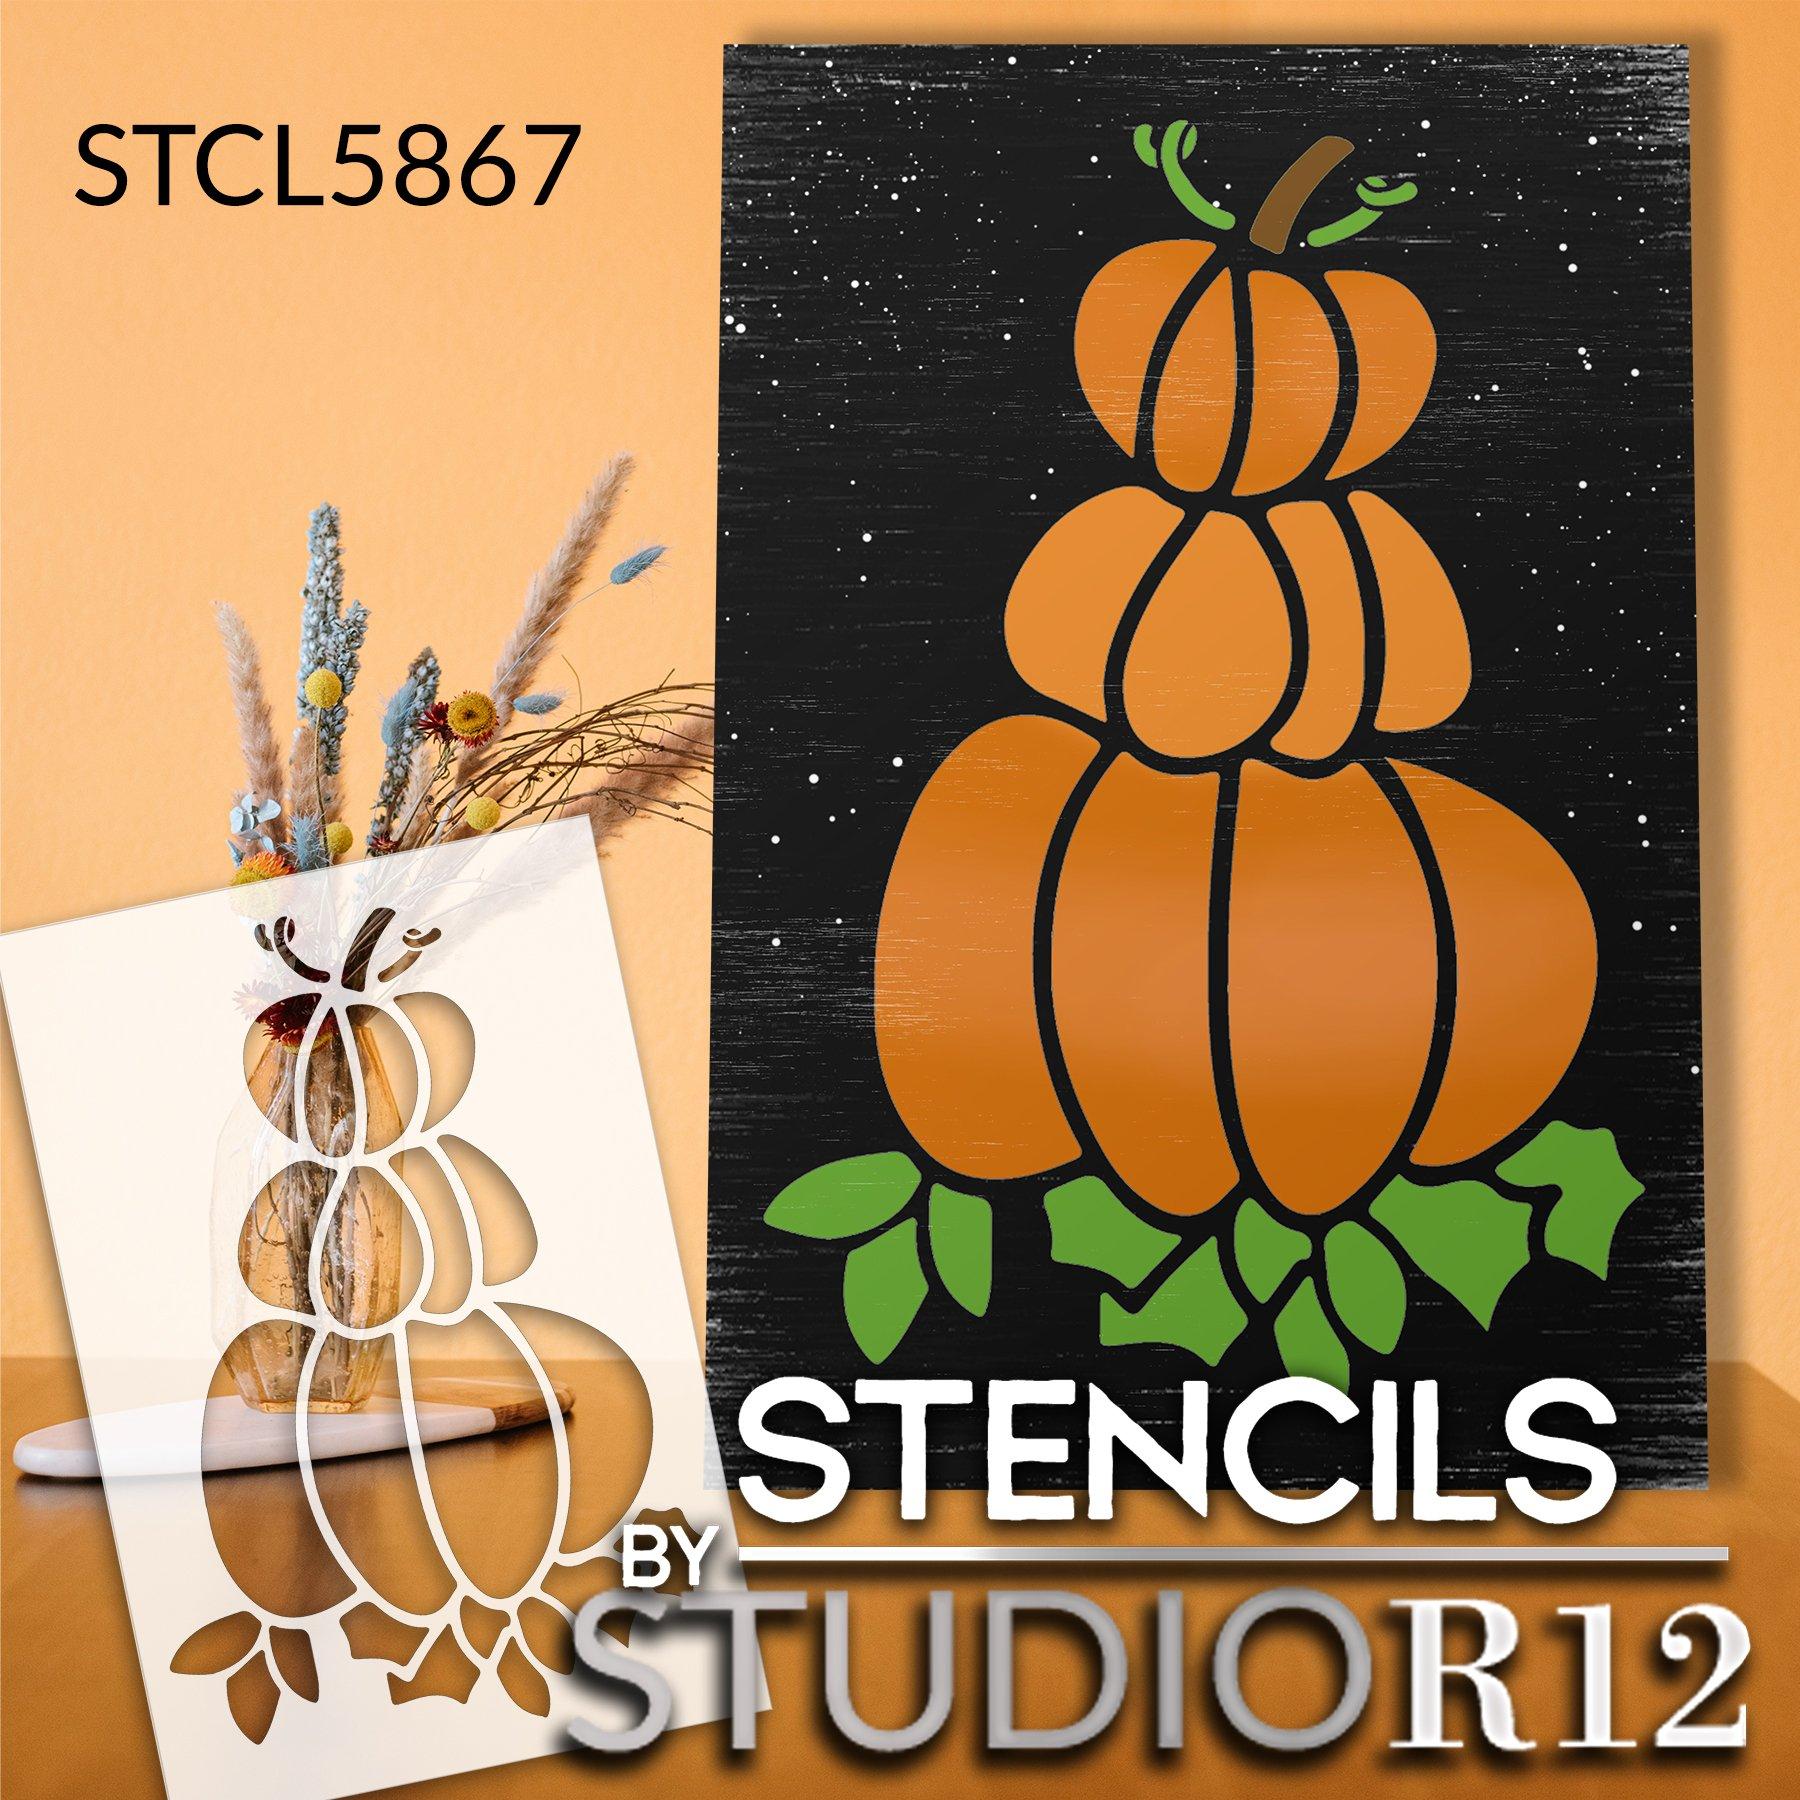 Pumpkin Stack Stencil by StudioR12 | Craft DIY Autumn Garden Porch Home Decor | Paint Fall Farmhouse Wood Sign | Reusable Mylar Template | Select Size